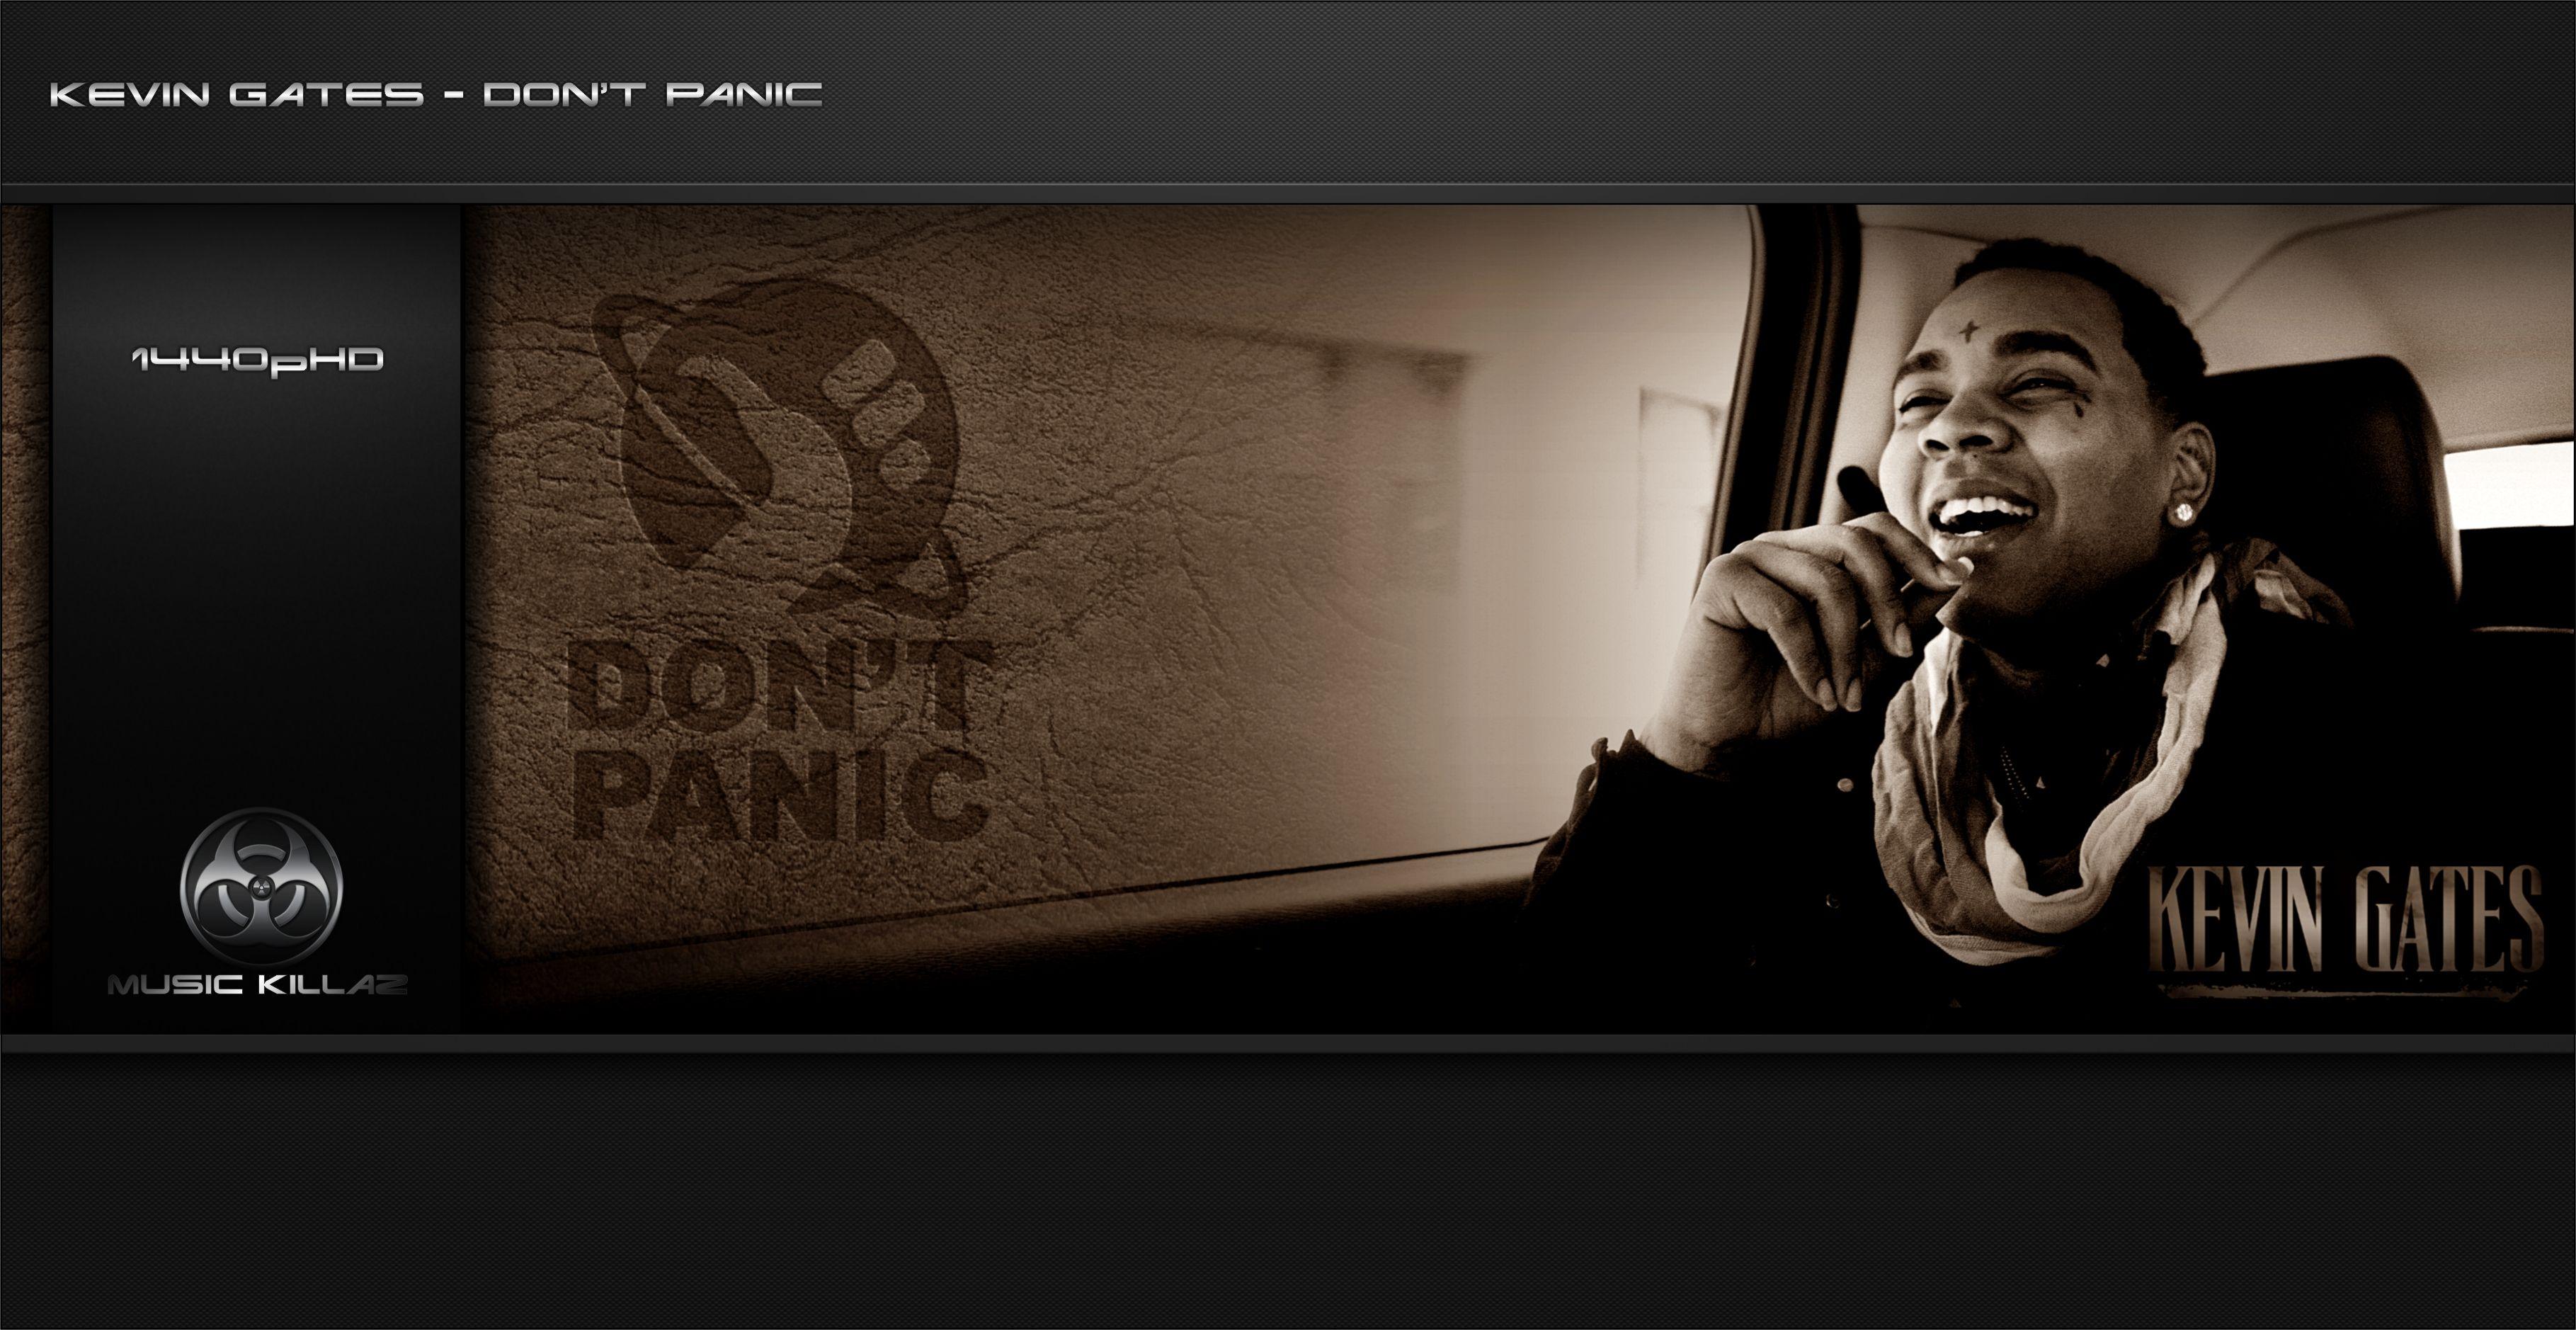 Kevin Gates - Don't Panic [Luca Brasi 2] @ MUSIC KILLAZ